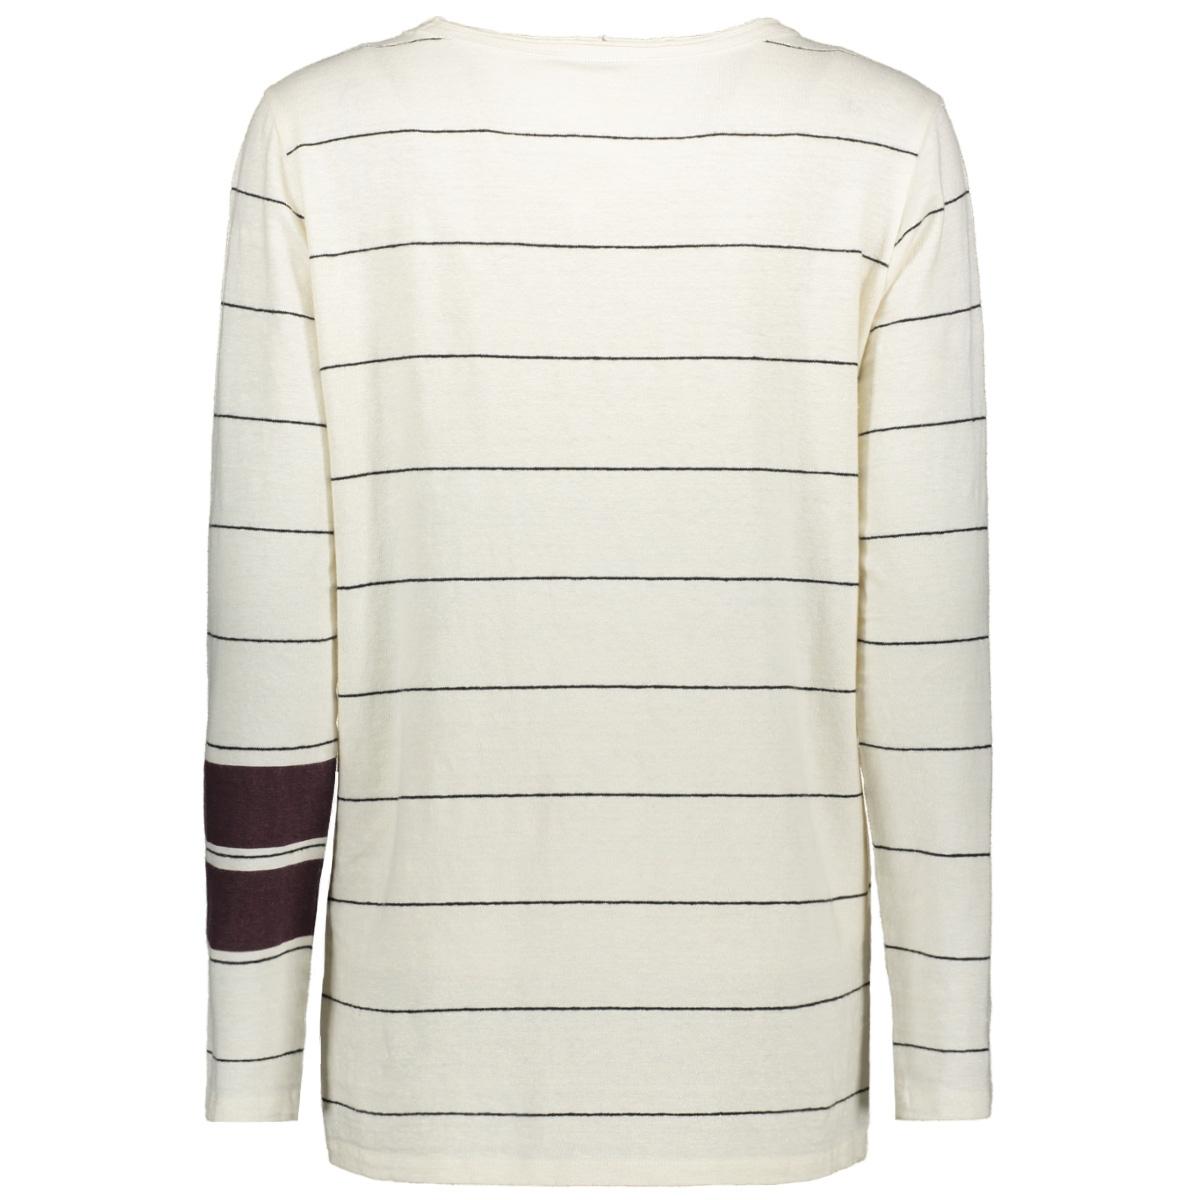 longsleeve tee thin 20 782 8103 10 days t-shirt white/black